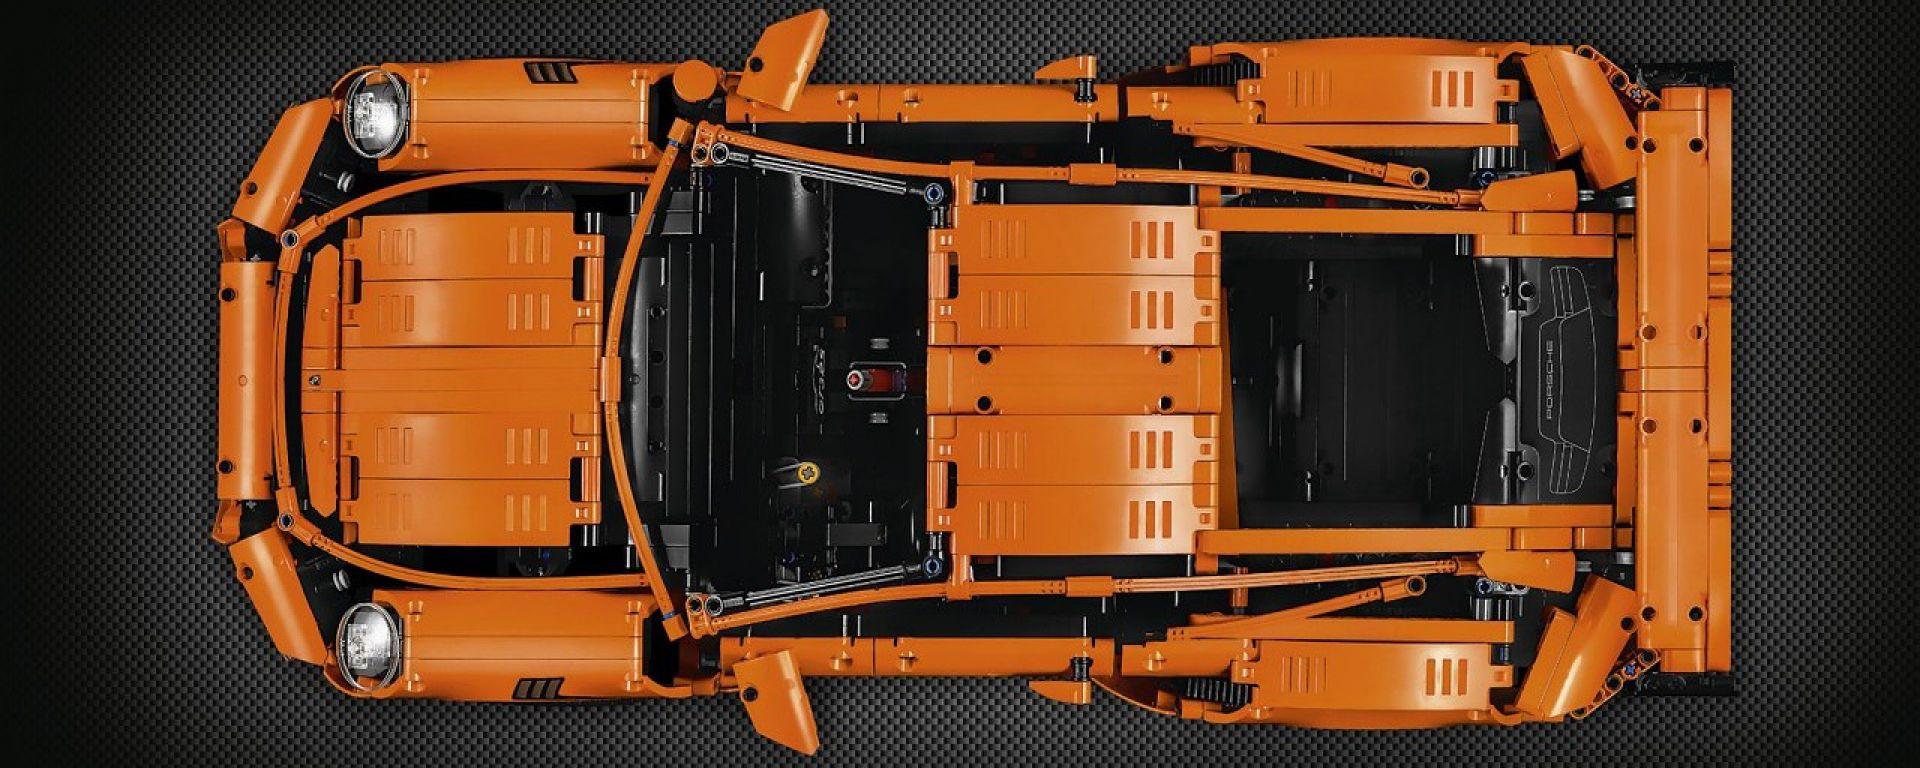 Lego Technic: arriva la Porsche 911 GT3 RS